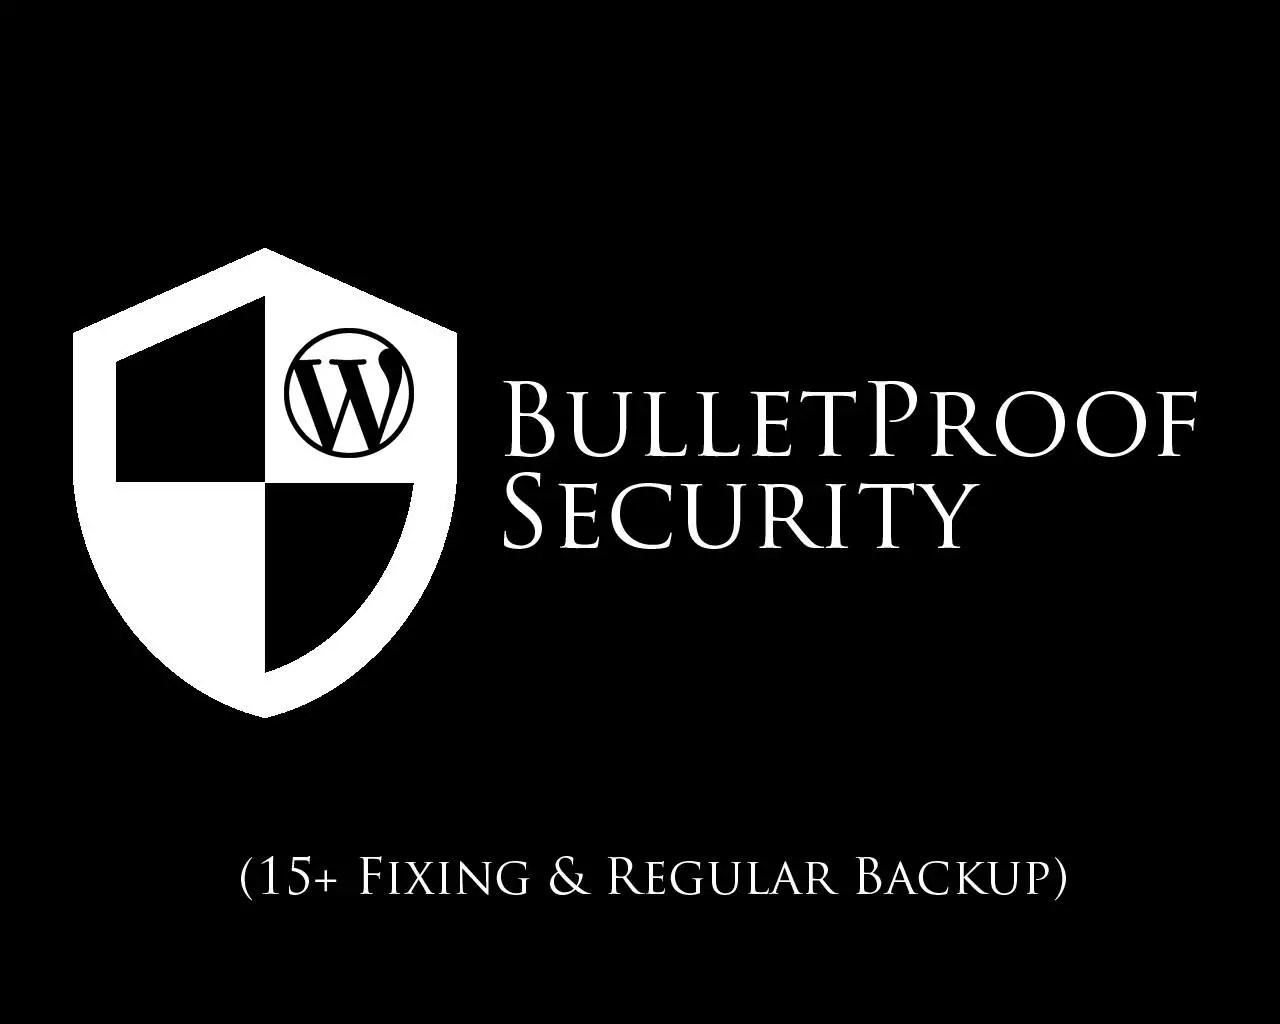 BulletproofSecurity